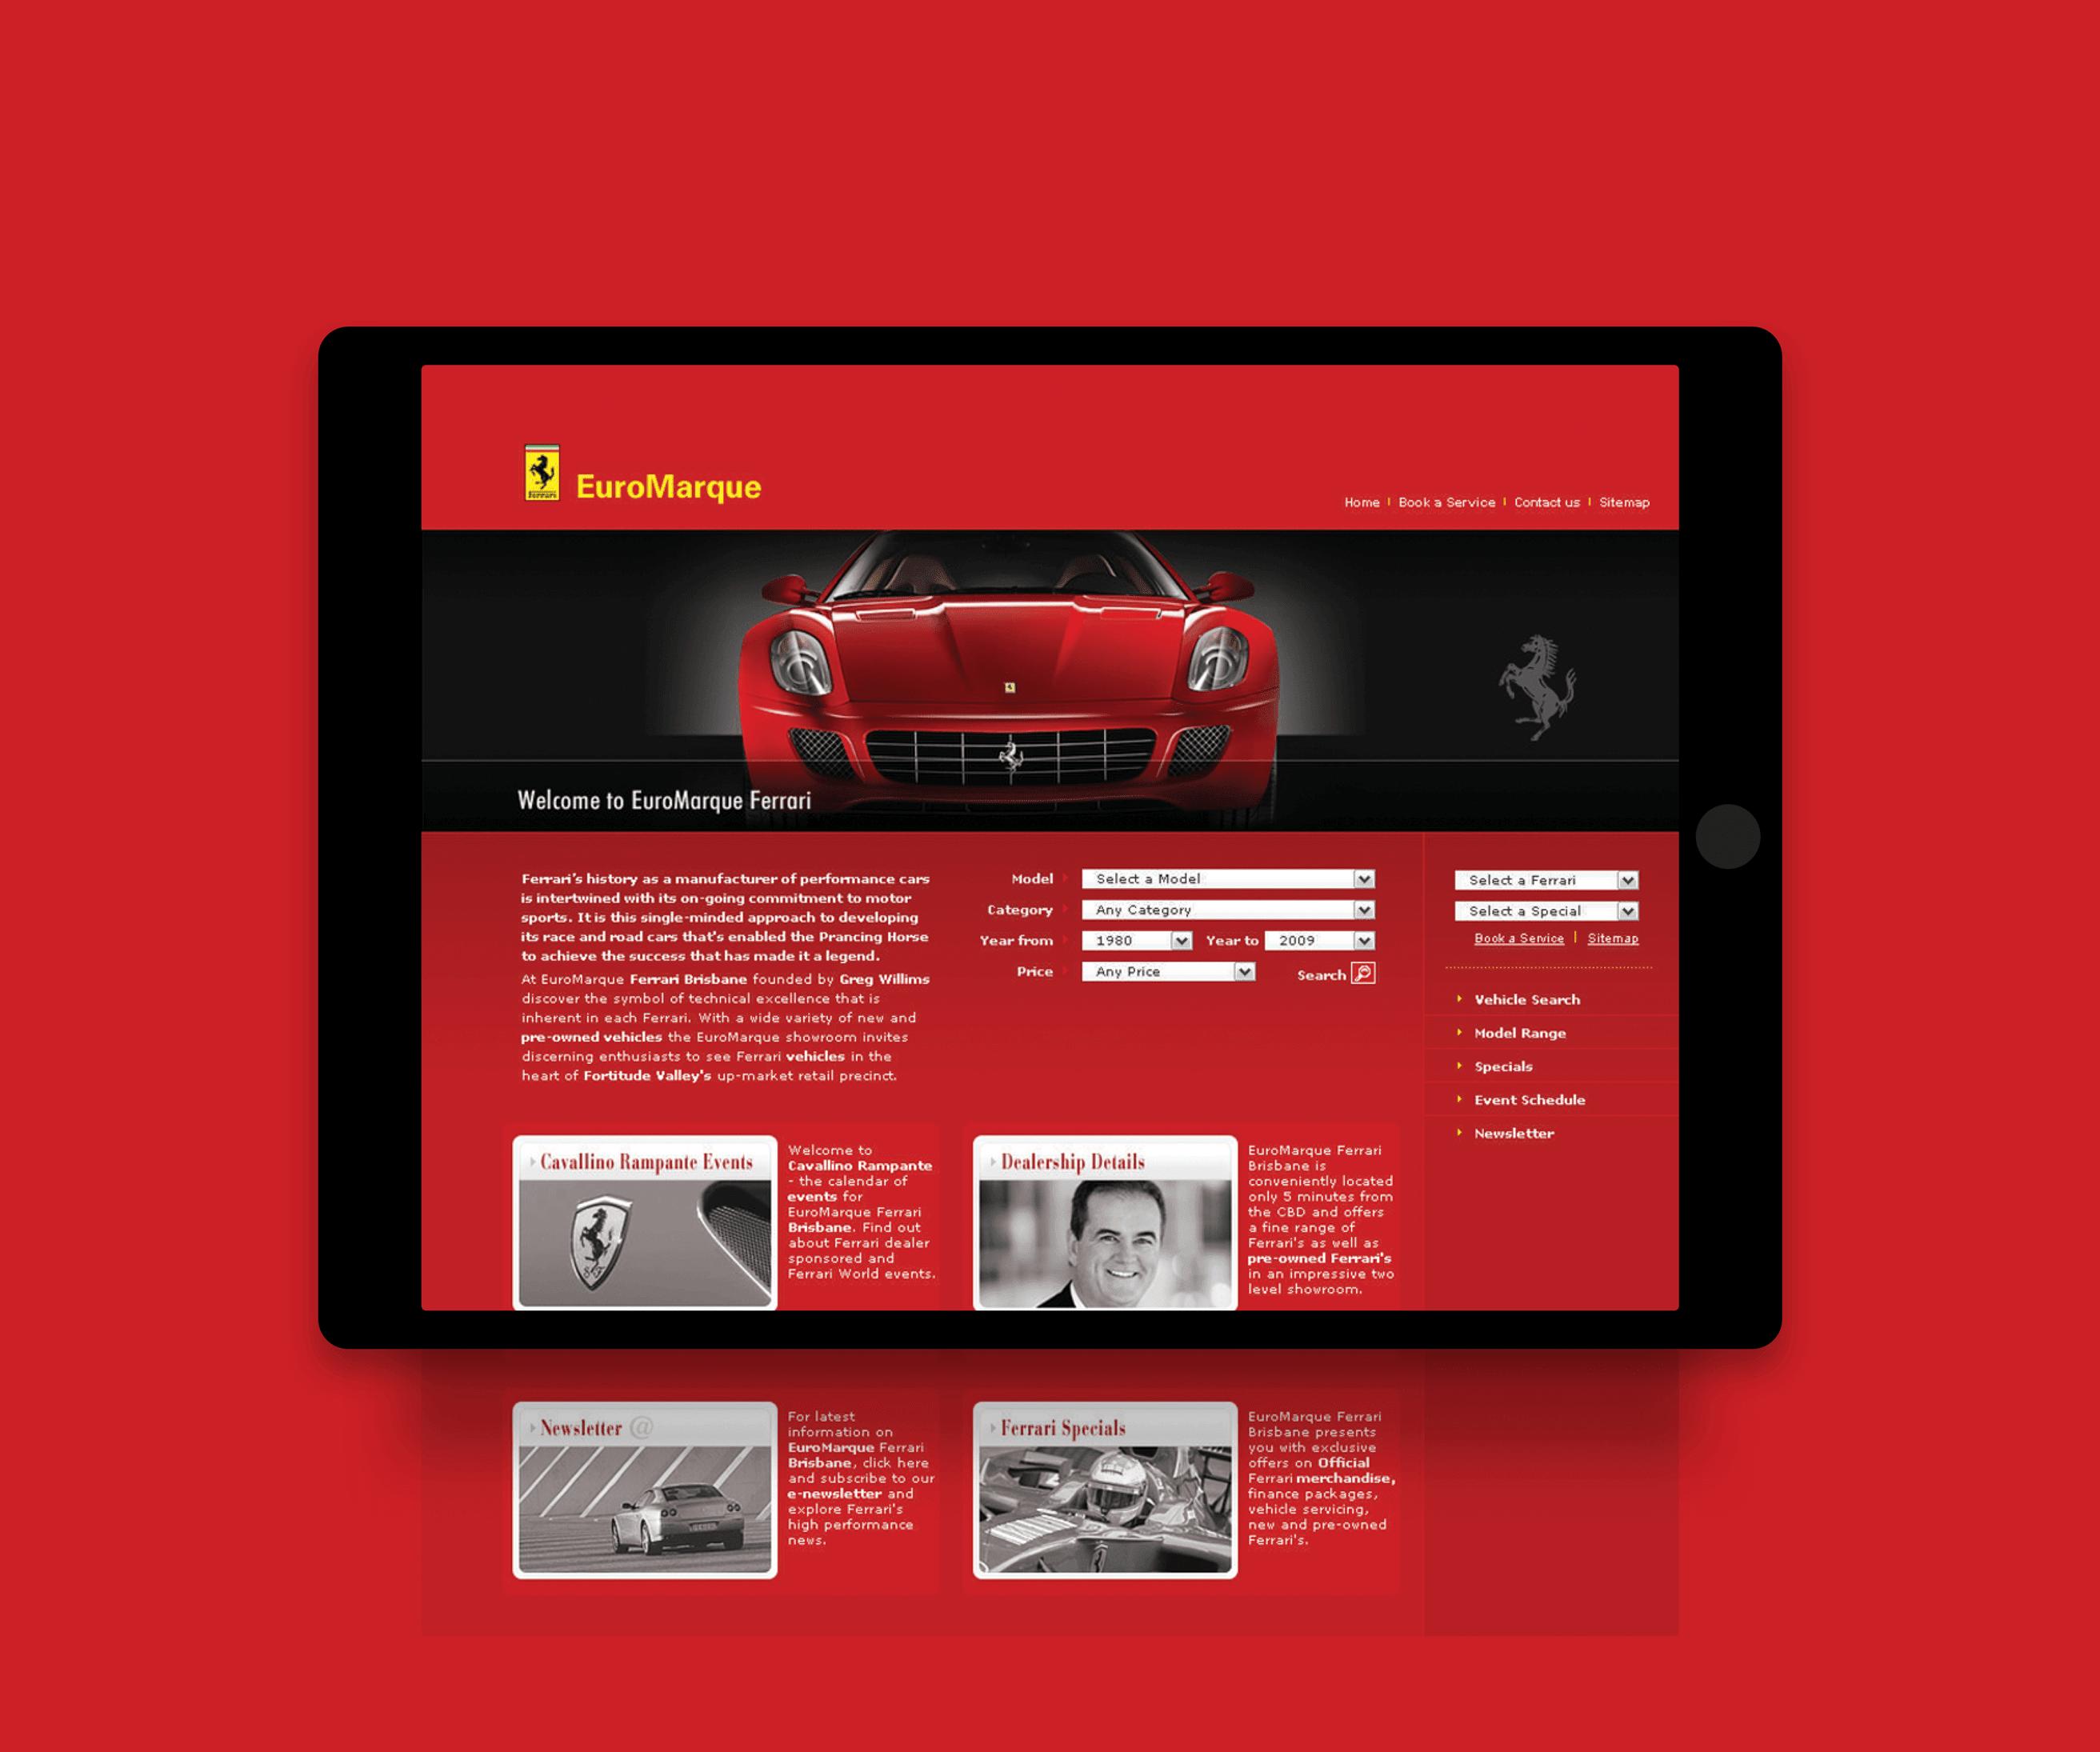 FerrariBrisbane-Dealership-website-001@3x-mobile